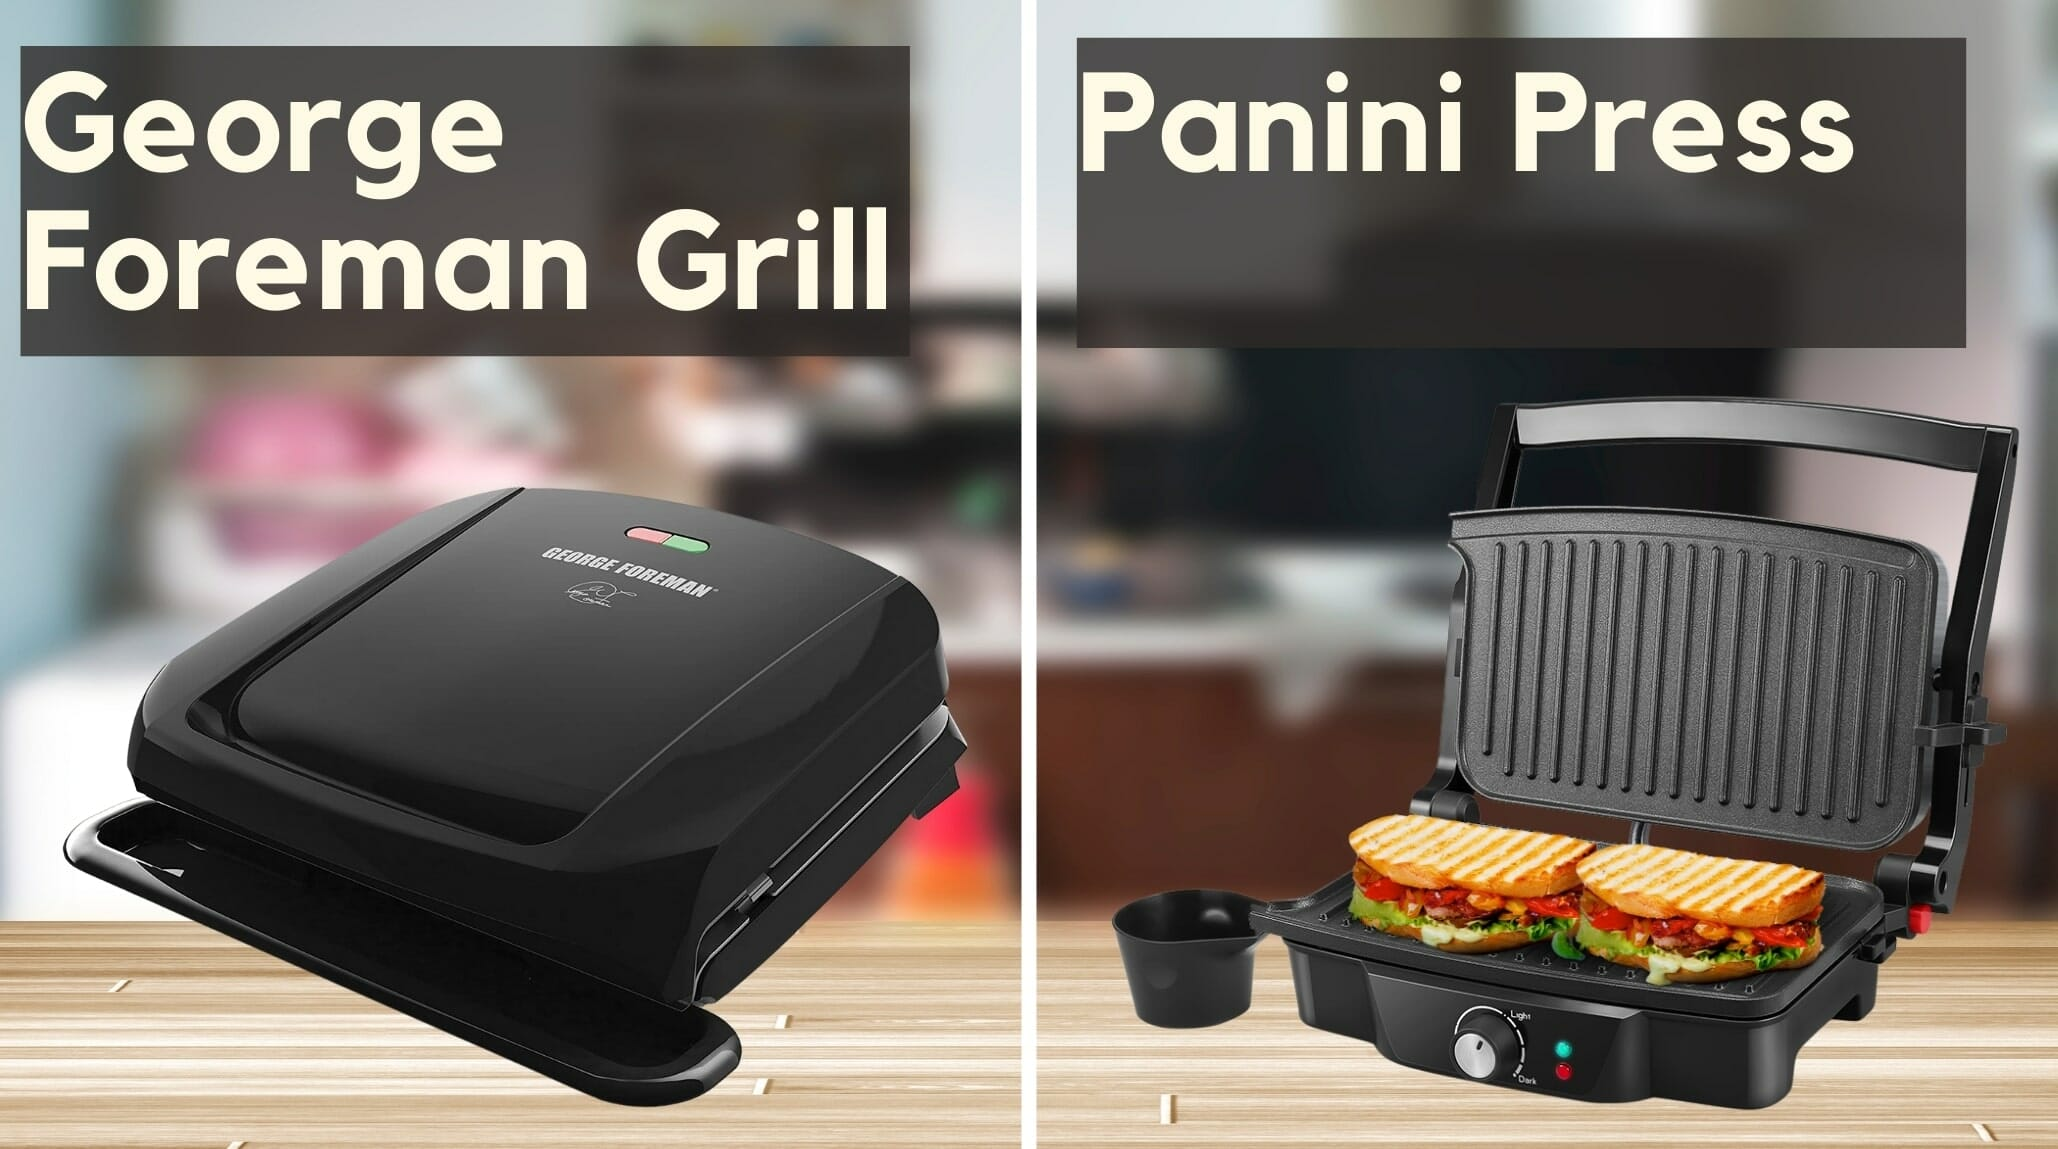 george foreman grill vs panini press